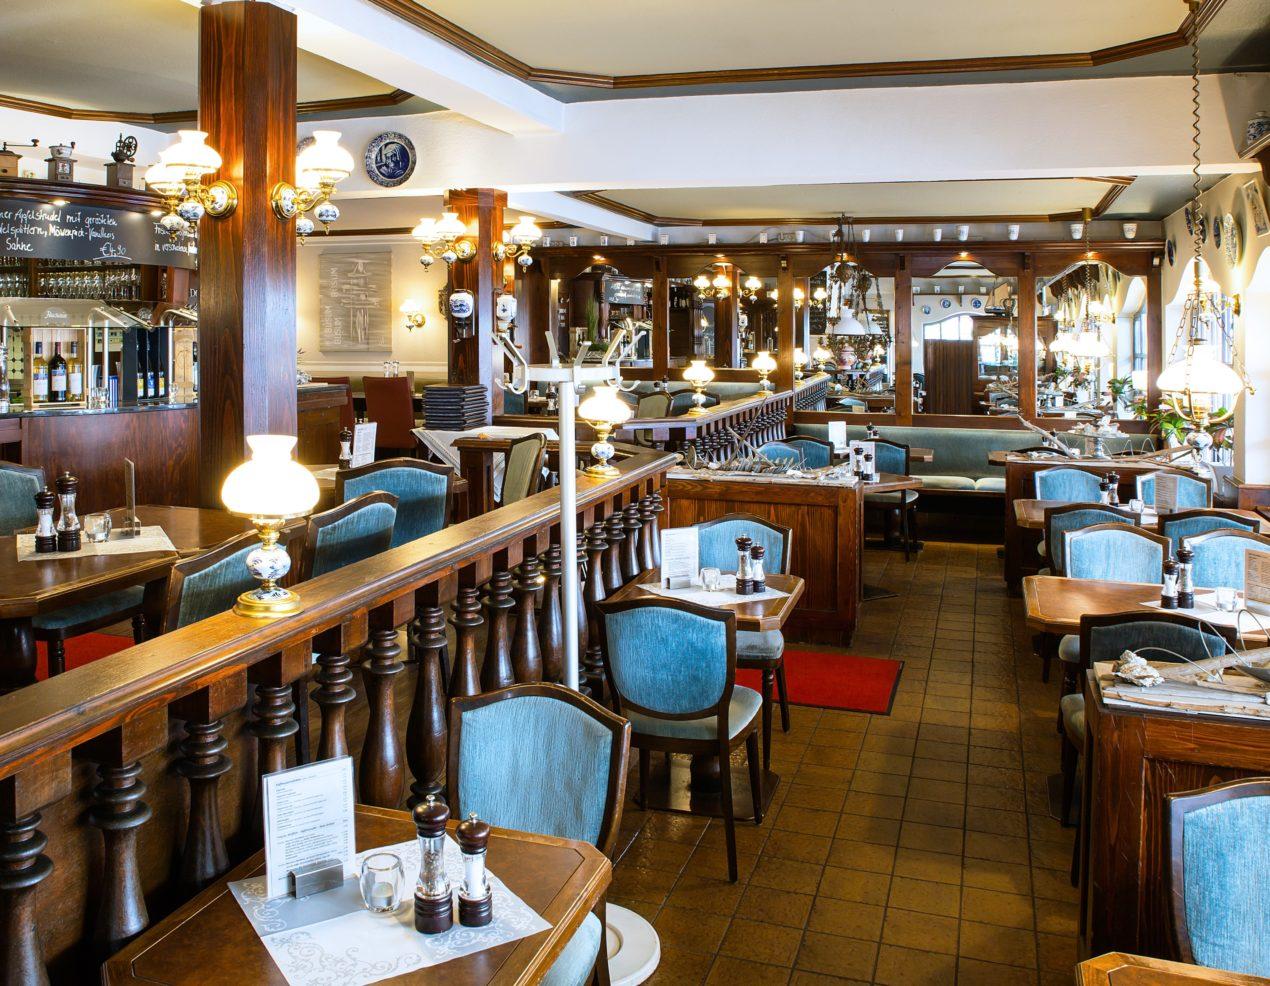 cafemitrestaurantampark_fGalerie1